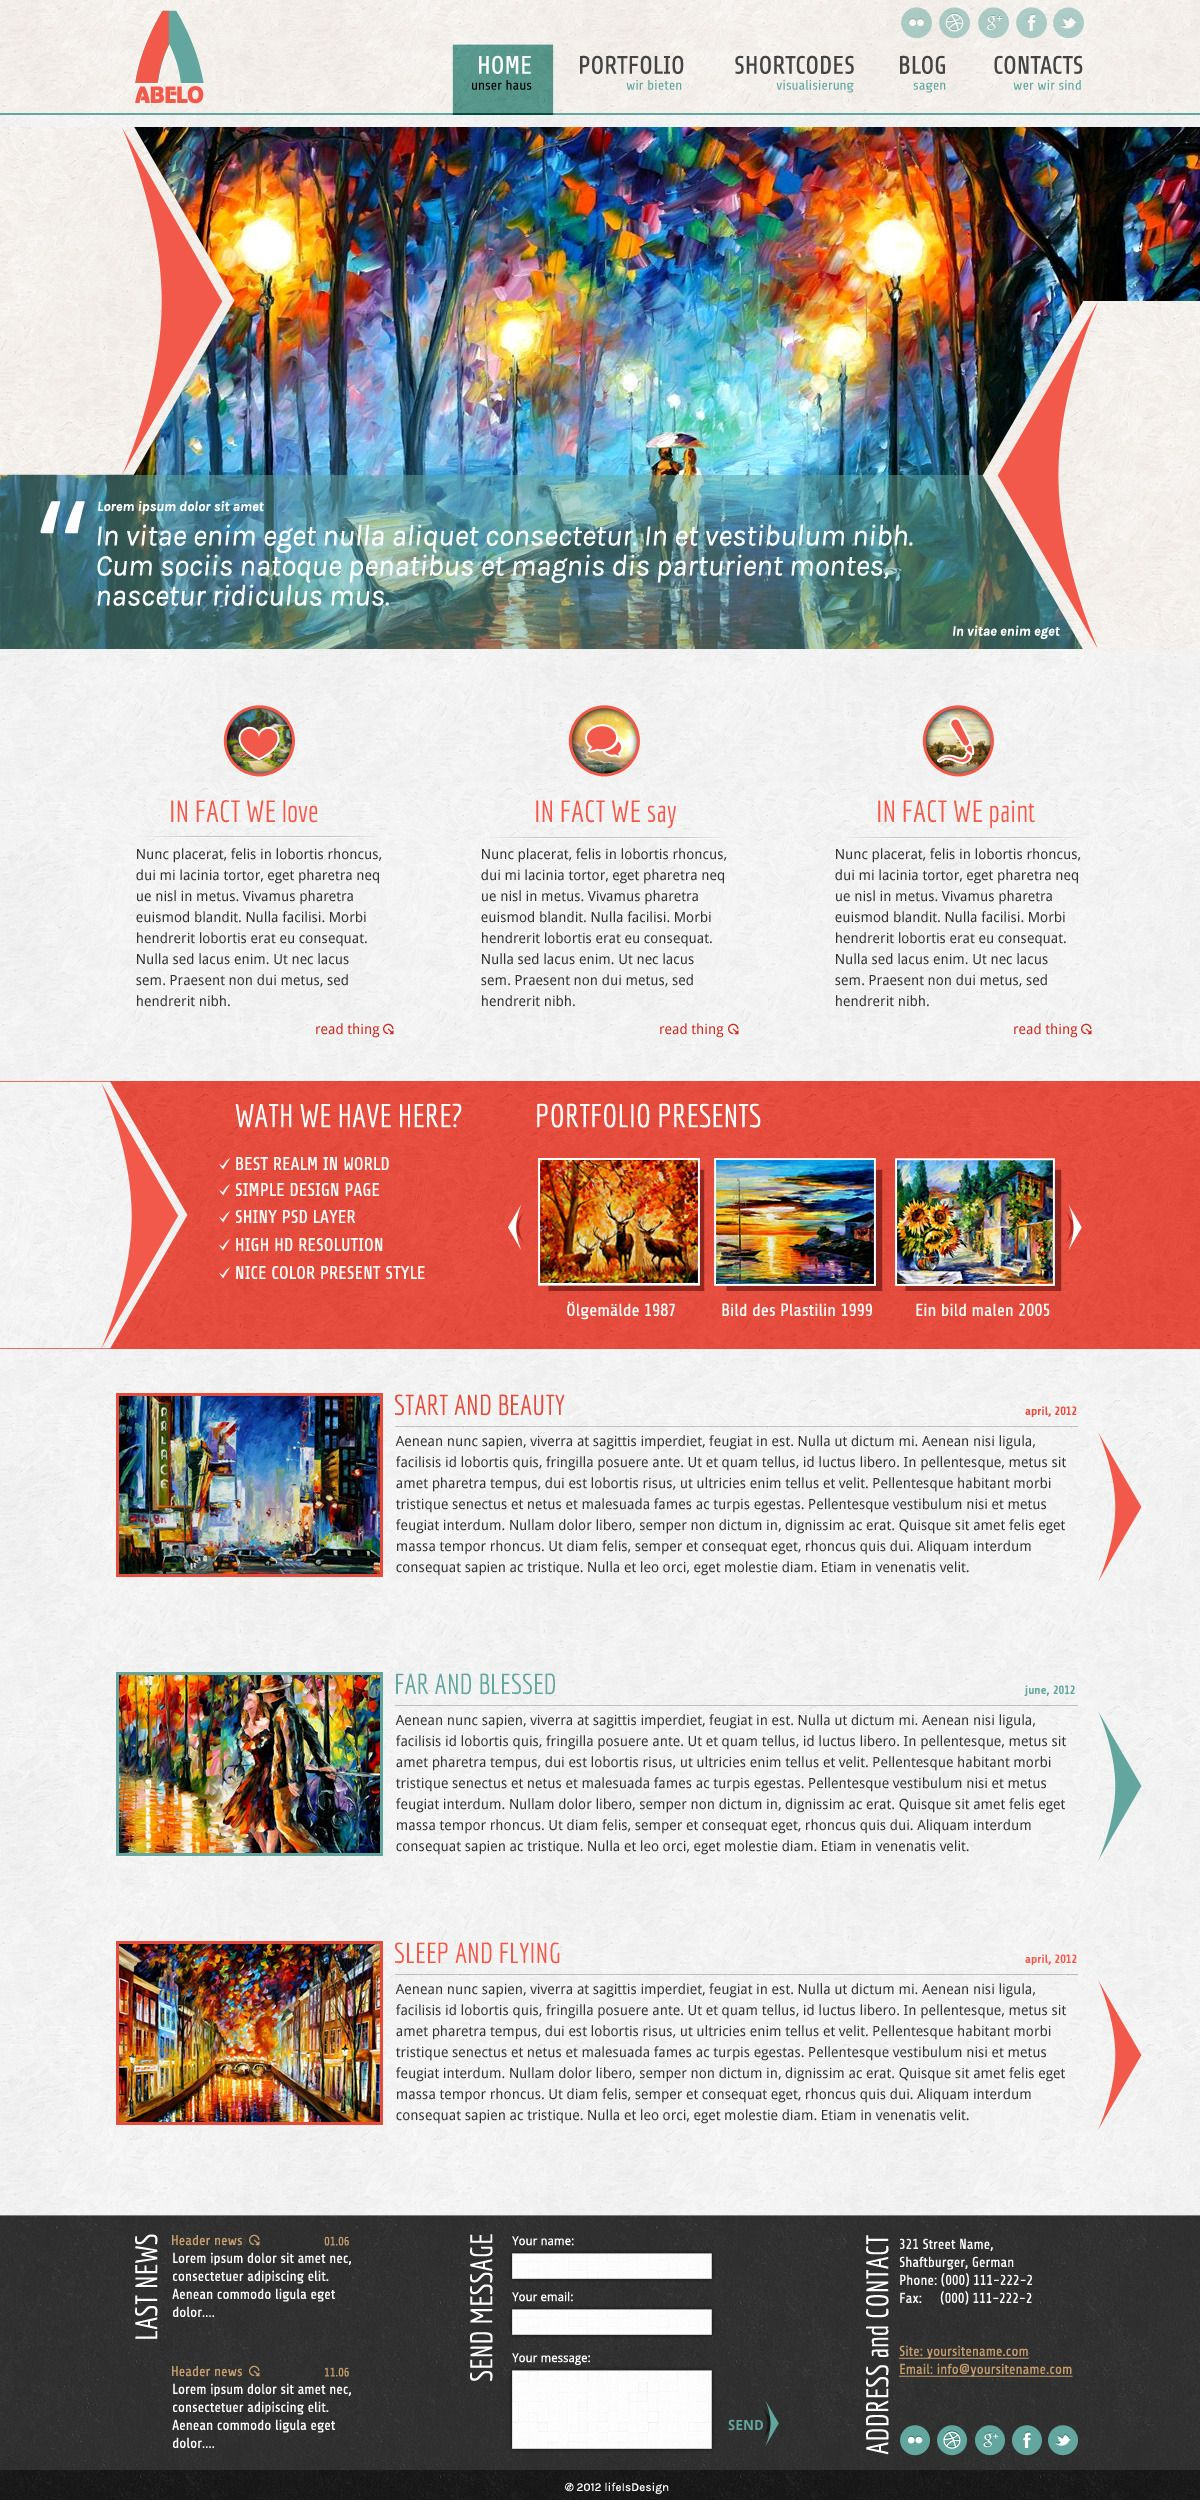 cool & colorful web design | Inspiration | Web | Pinterest ...